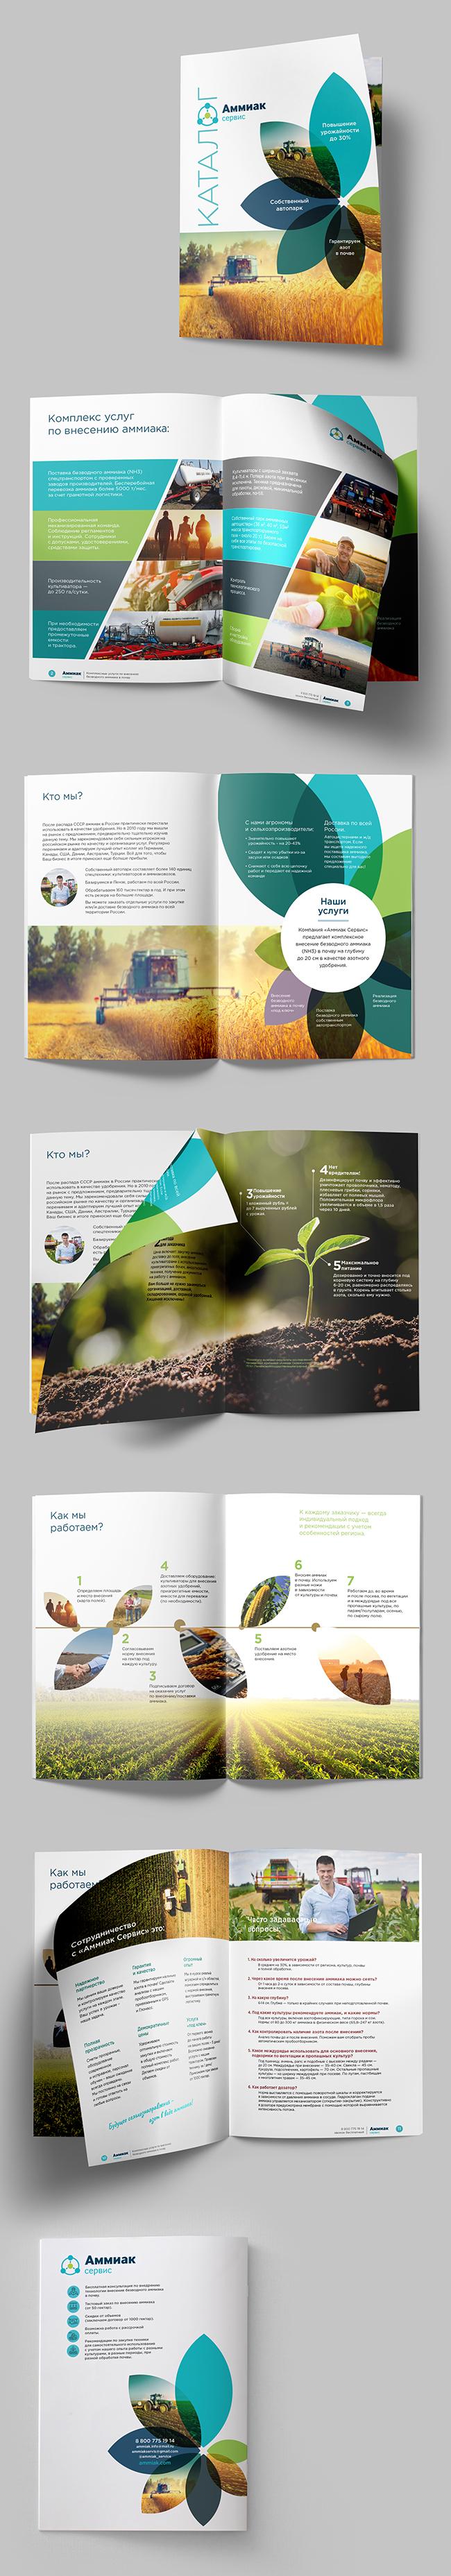 Ammiak Brochures 650